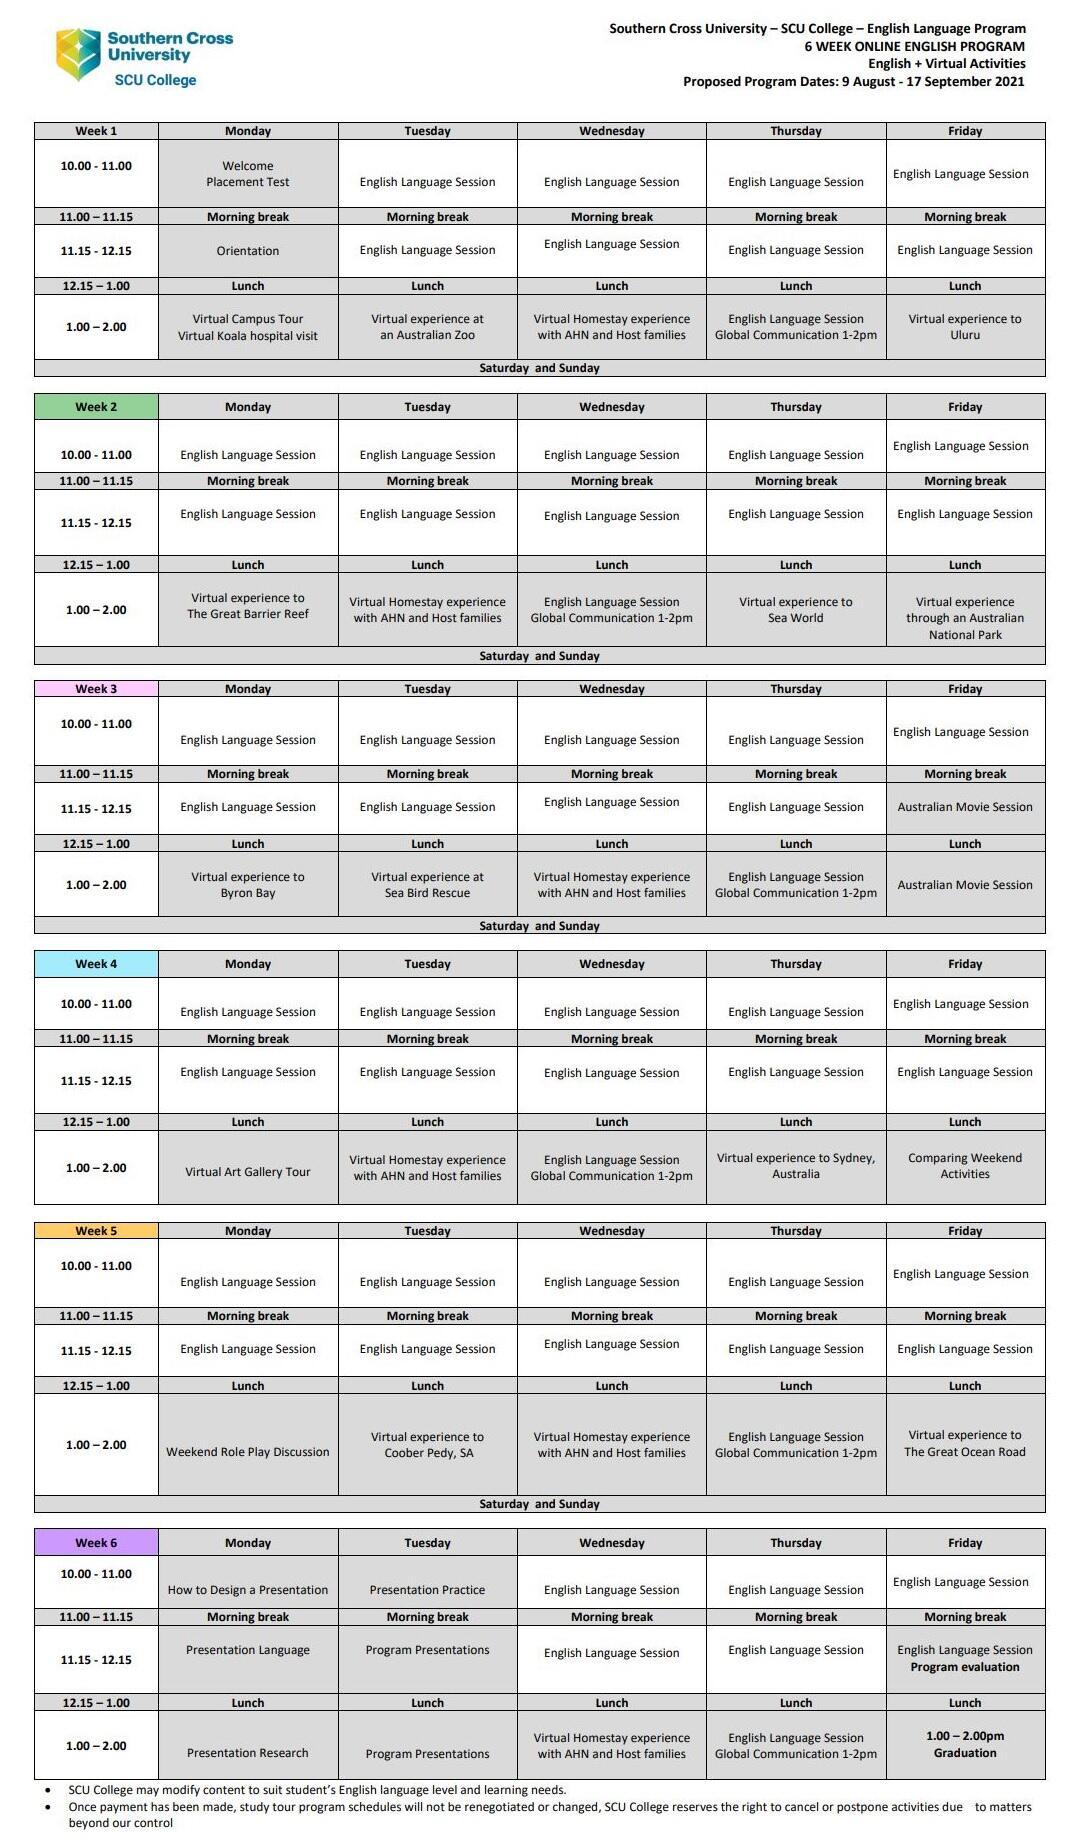 https://www.ryugaku.co.jp/column/images/SCU_schedule_summer1000.JPG